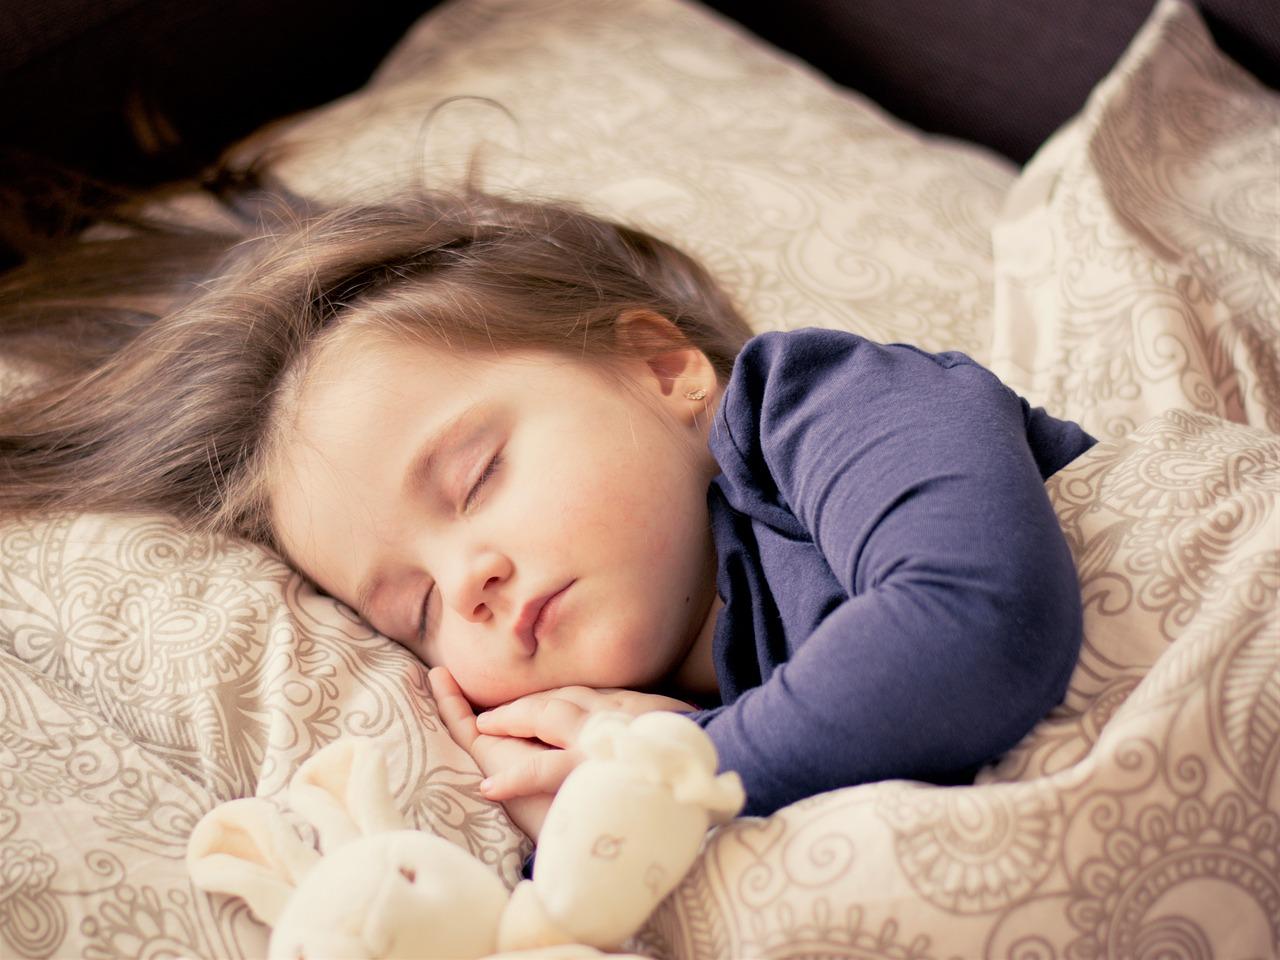 Toddler sleeping with night light